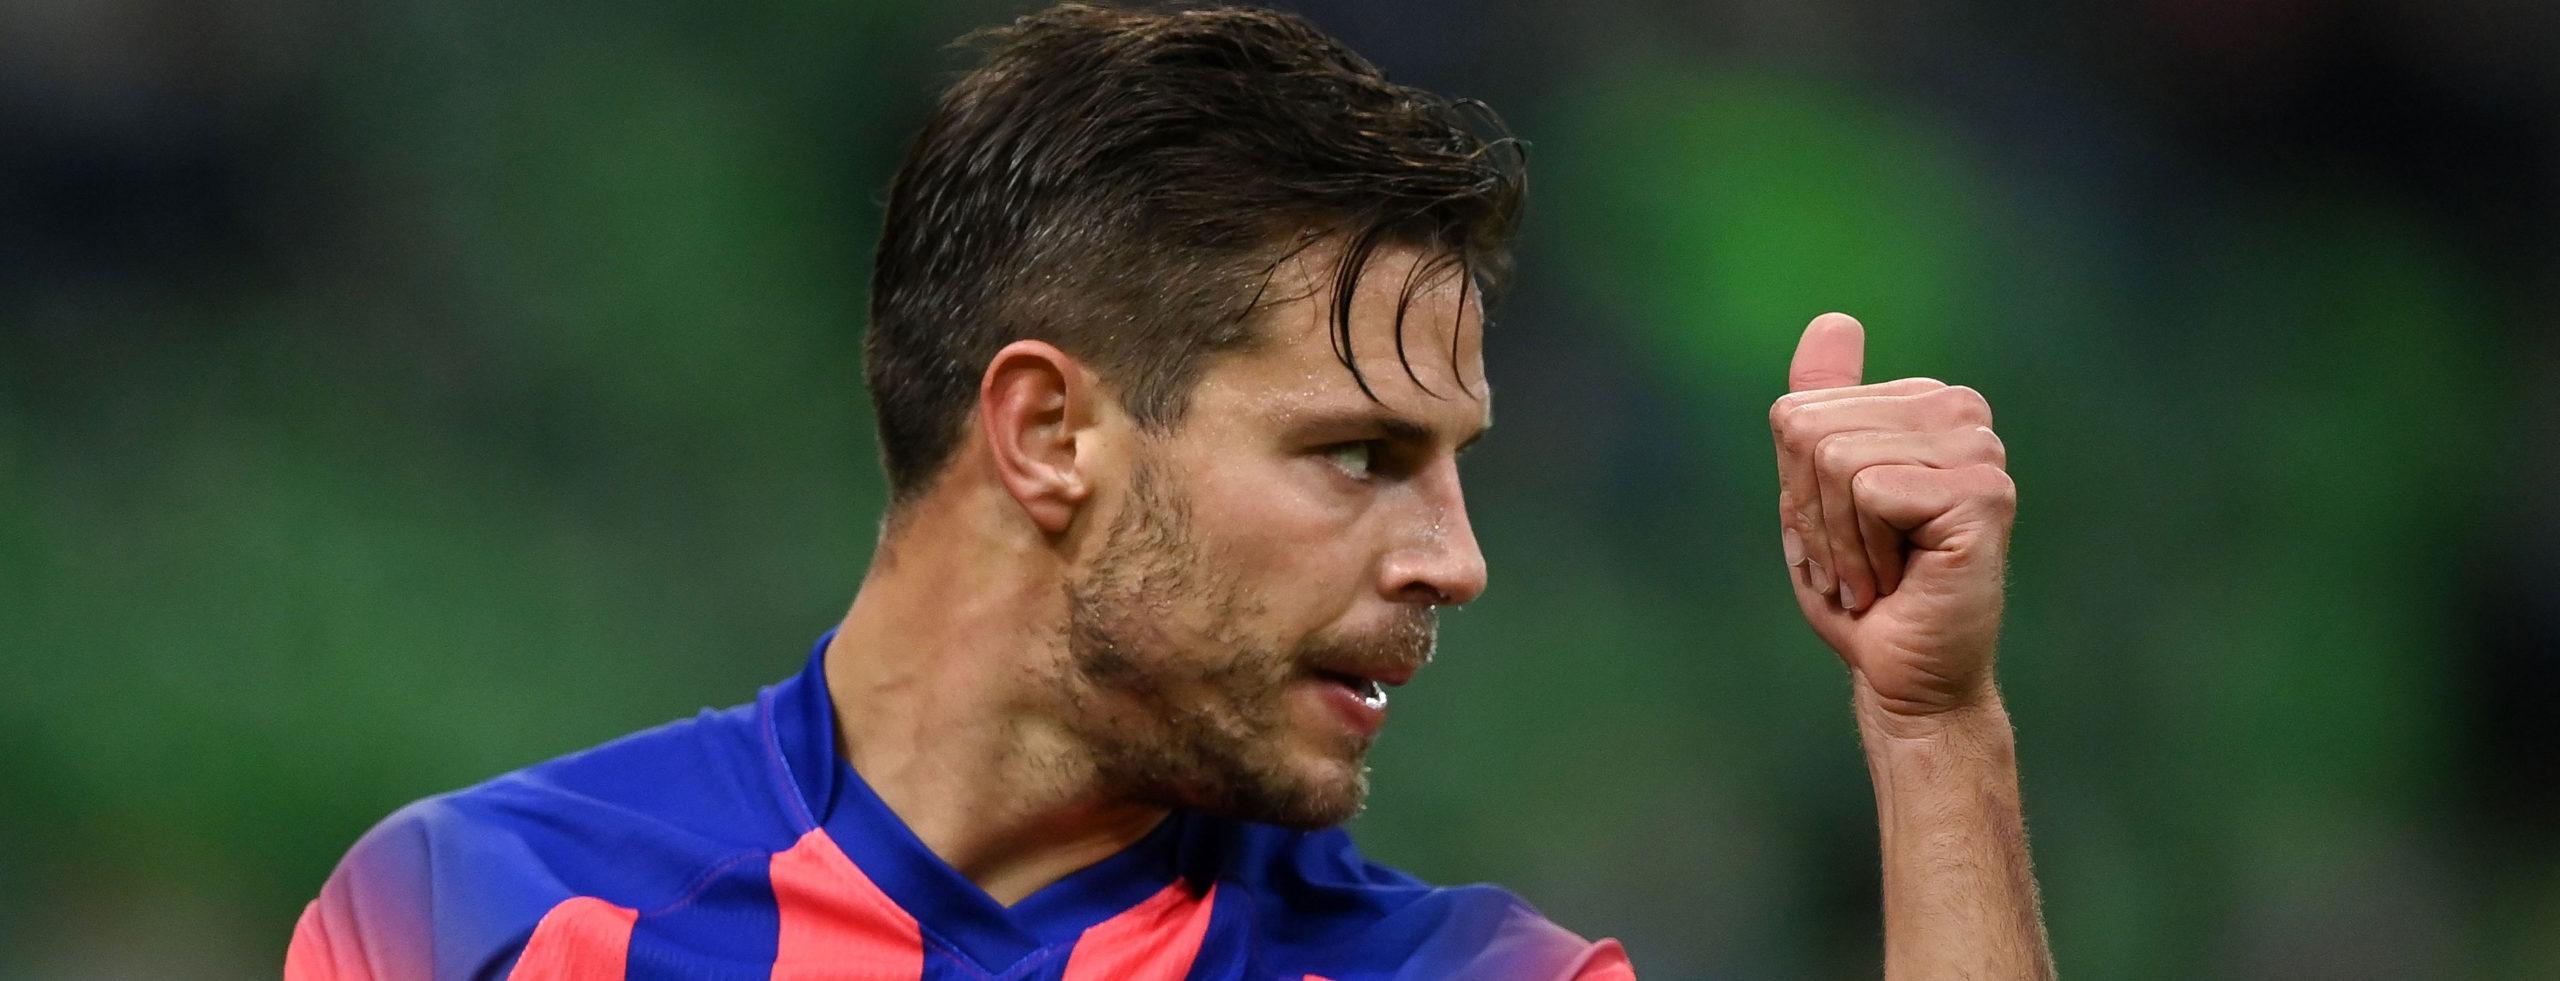 Barnsley vs Chelsea: Blues to cruise through again